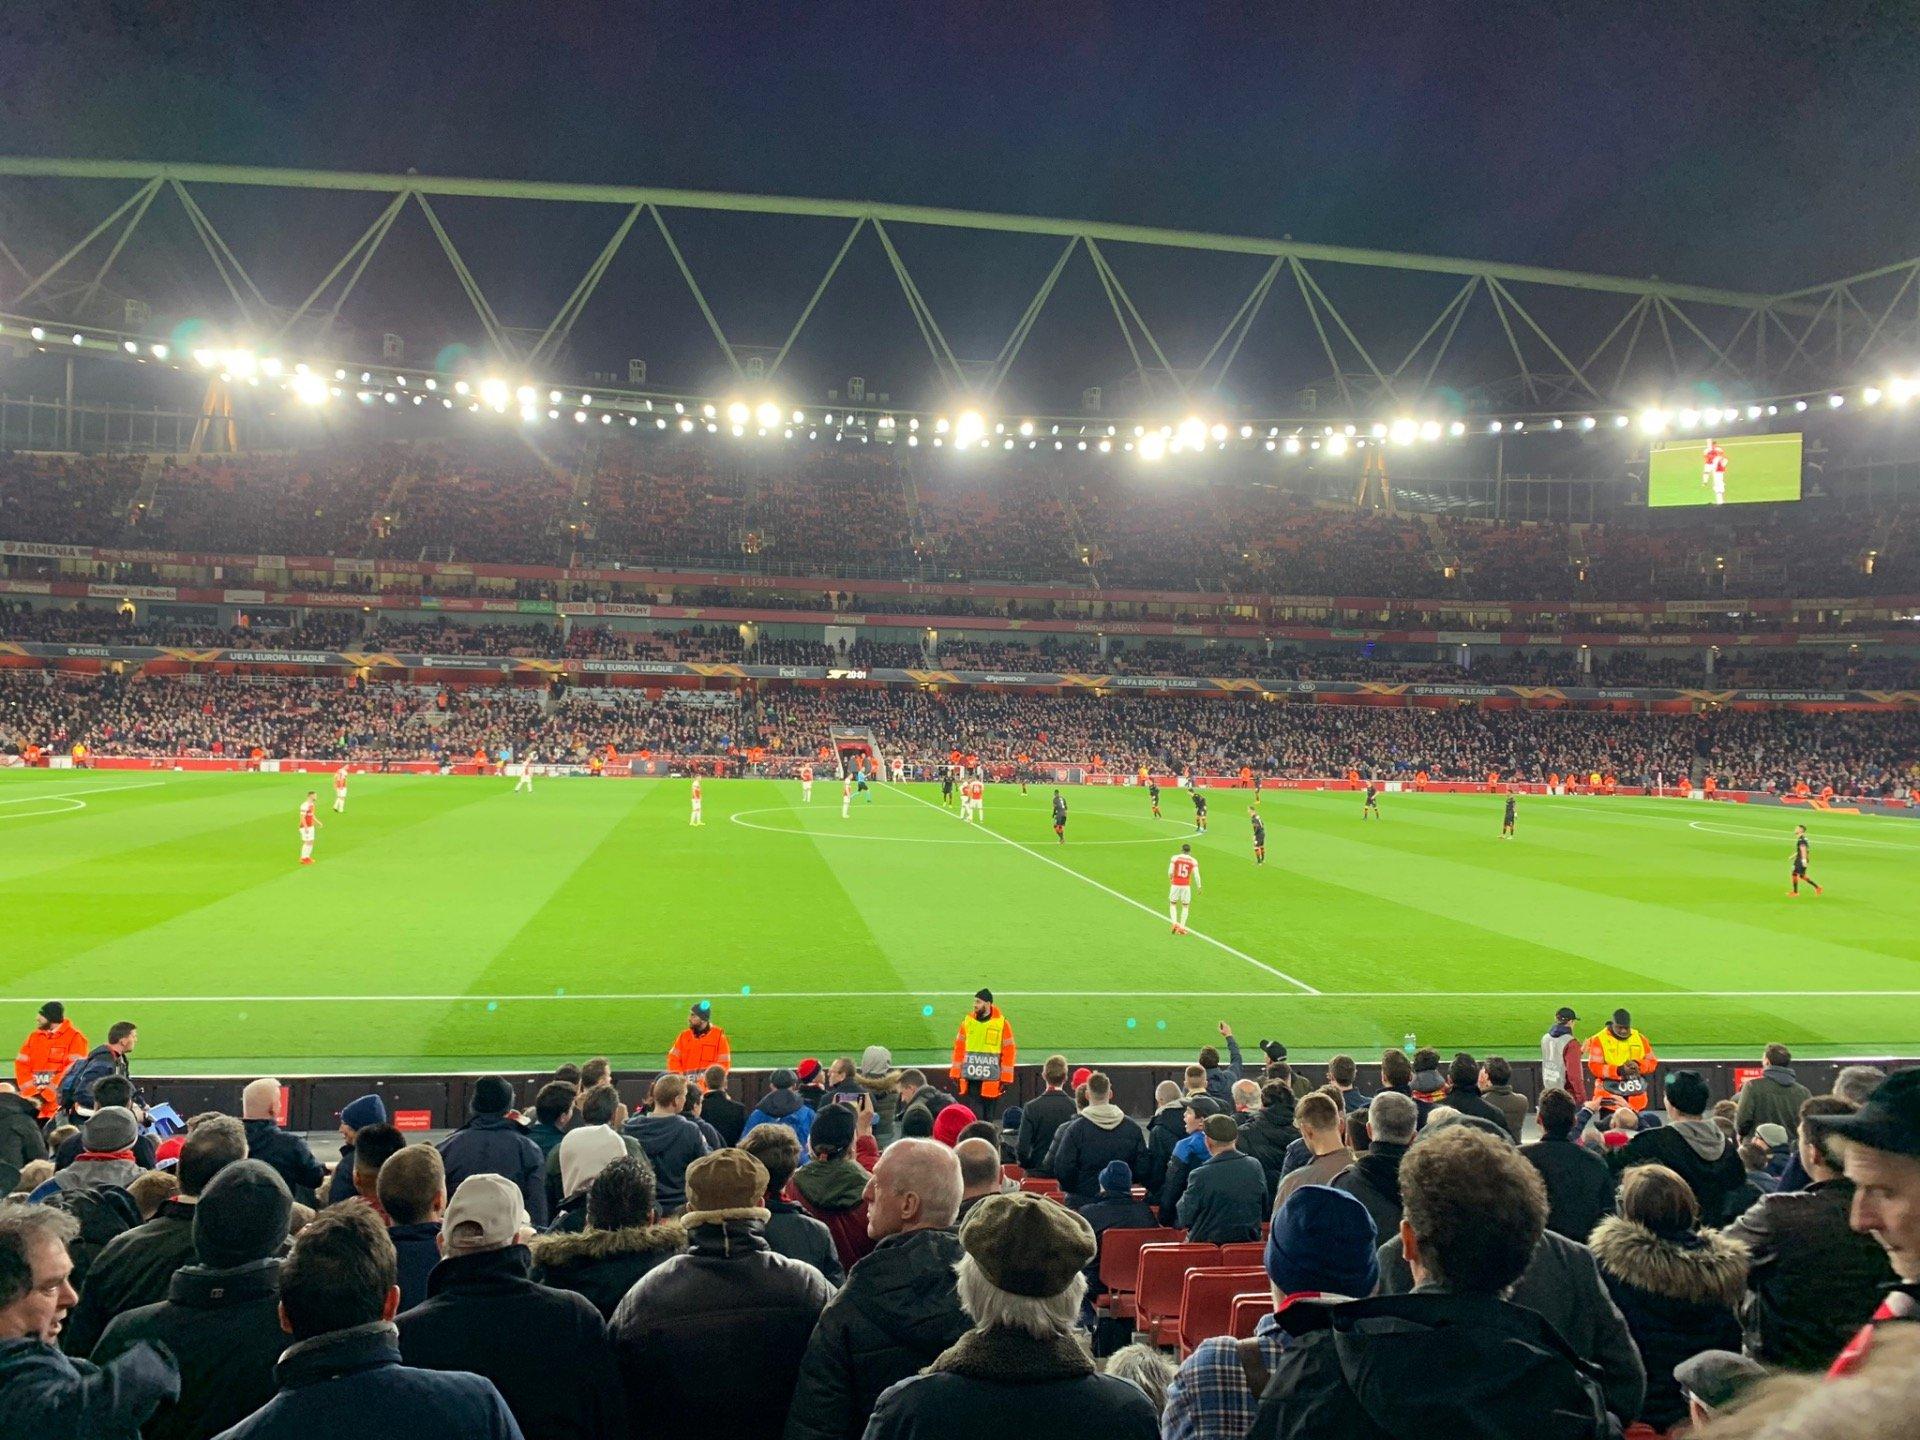 Emirates Stadium Section 17 Row 17 Seat 528